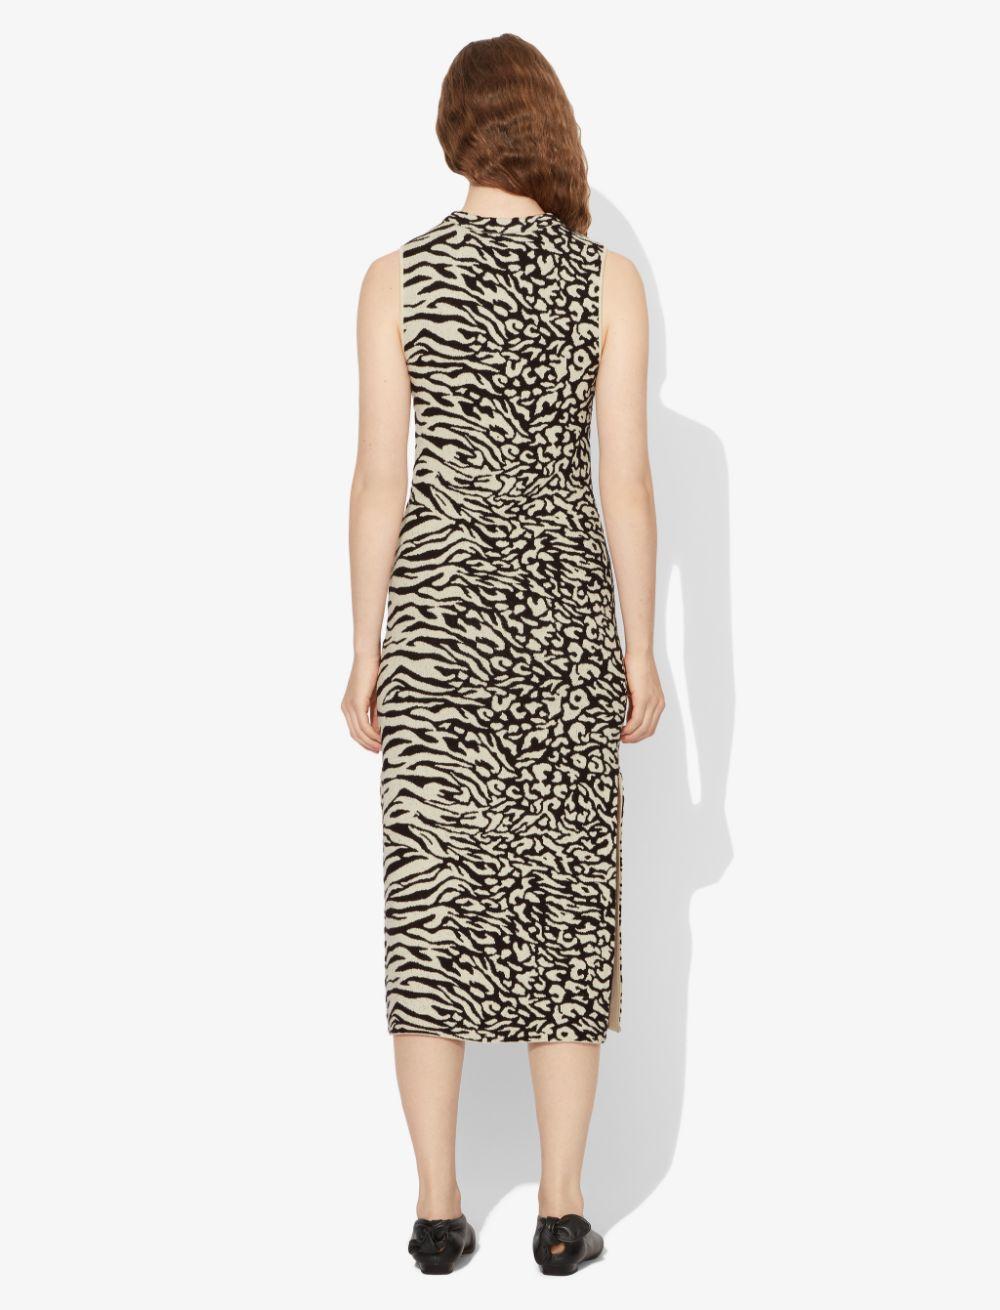 Proenza Schouler White Label Animal Jacquard Sleeveless Dress ecru/black XS